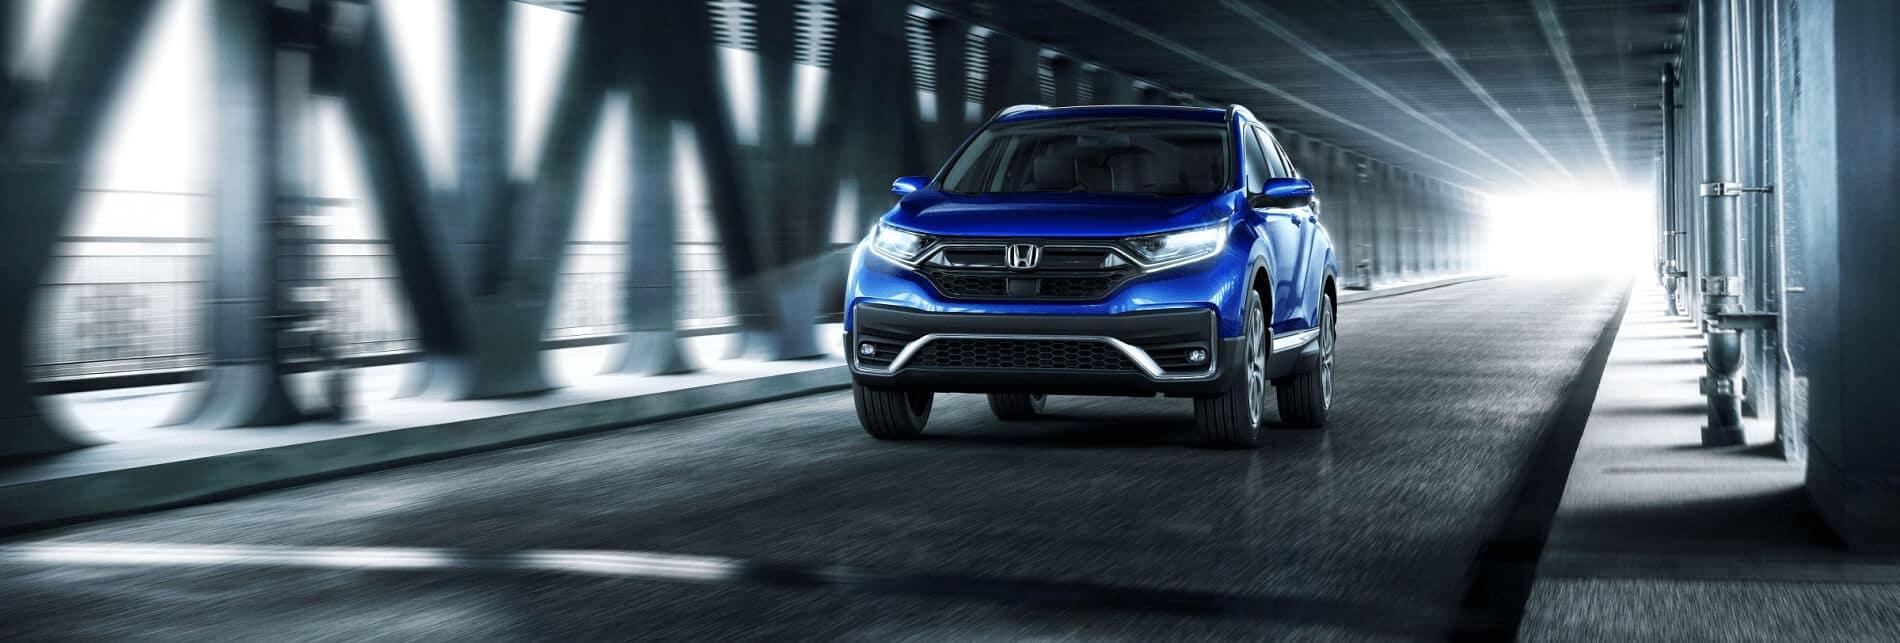 Blue Honda CR-V